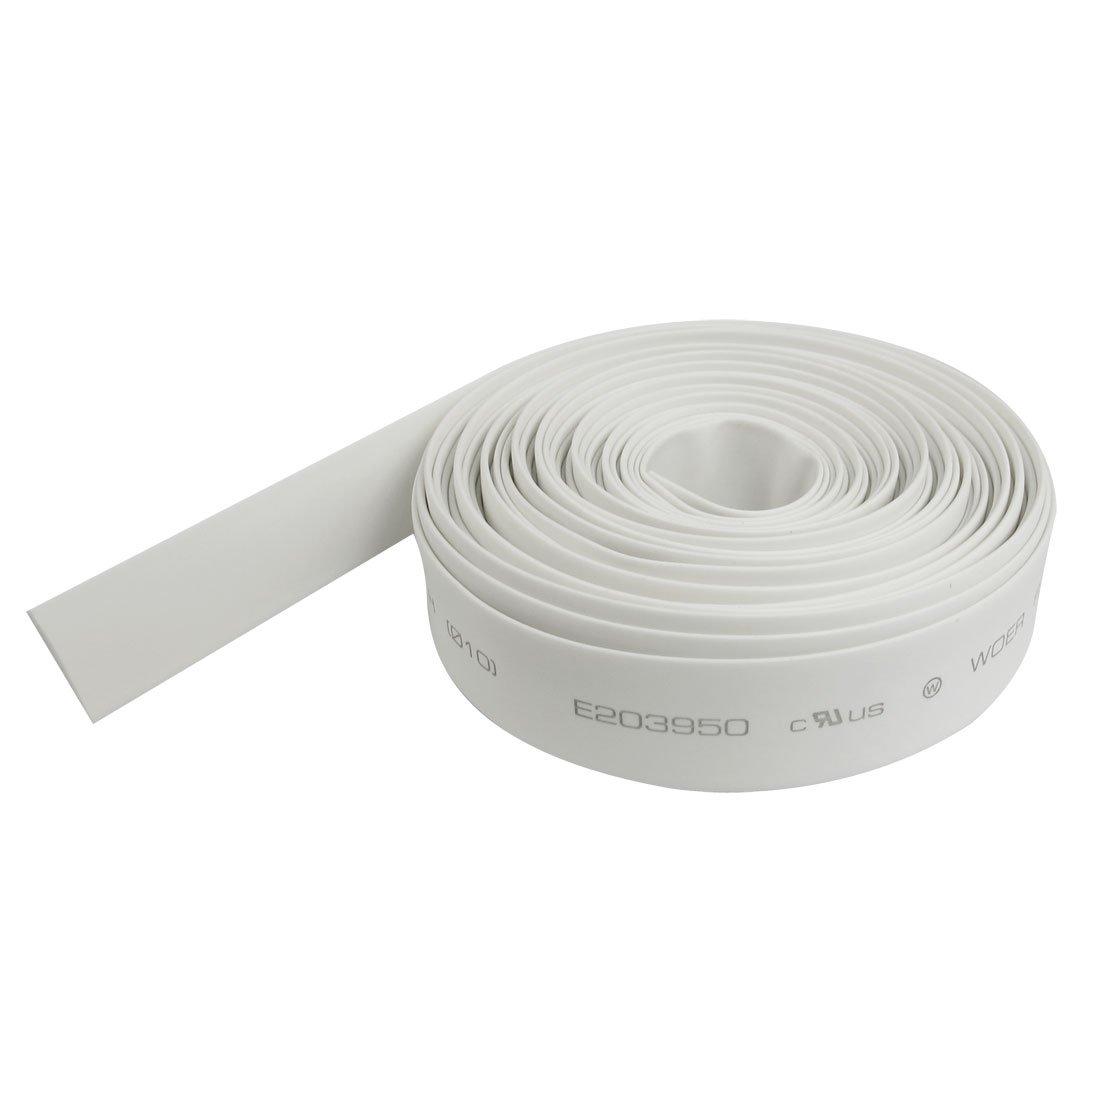 uxcell White 10mm Diameter Heat Shrink Tubing Shrinkable Tube Wire Wrap 6M